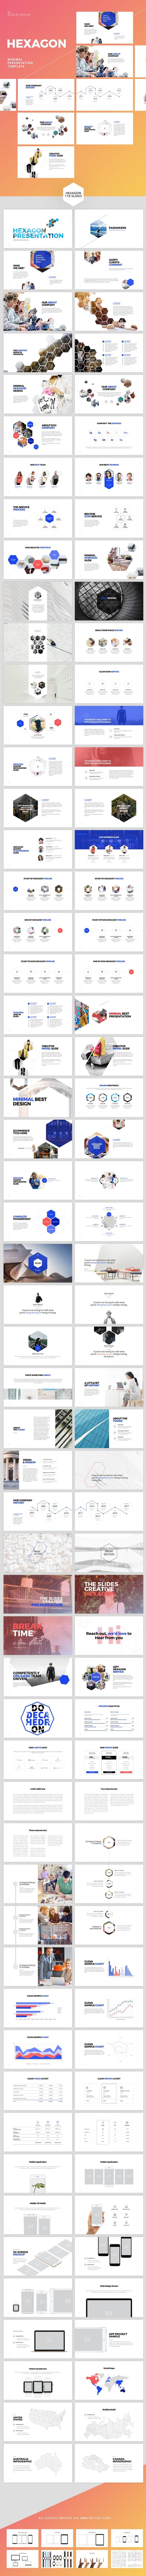 Hexagon Keynote Template - Creative Keynote Templates